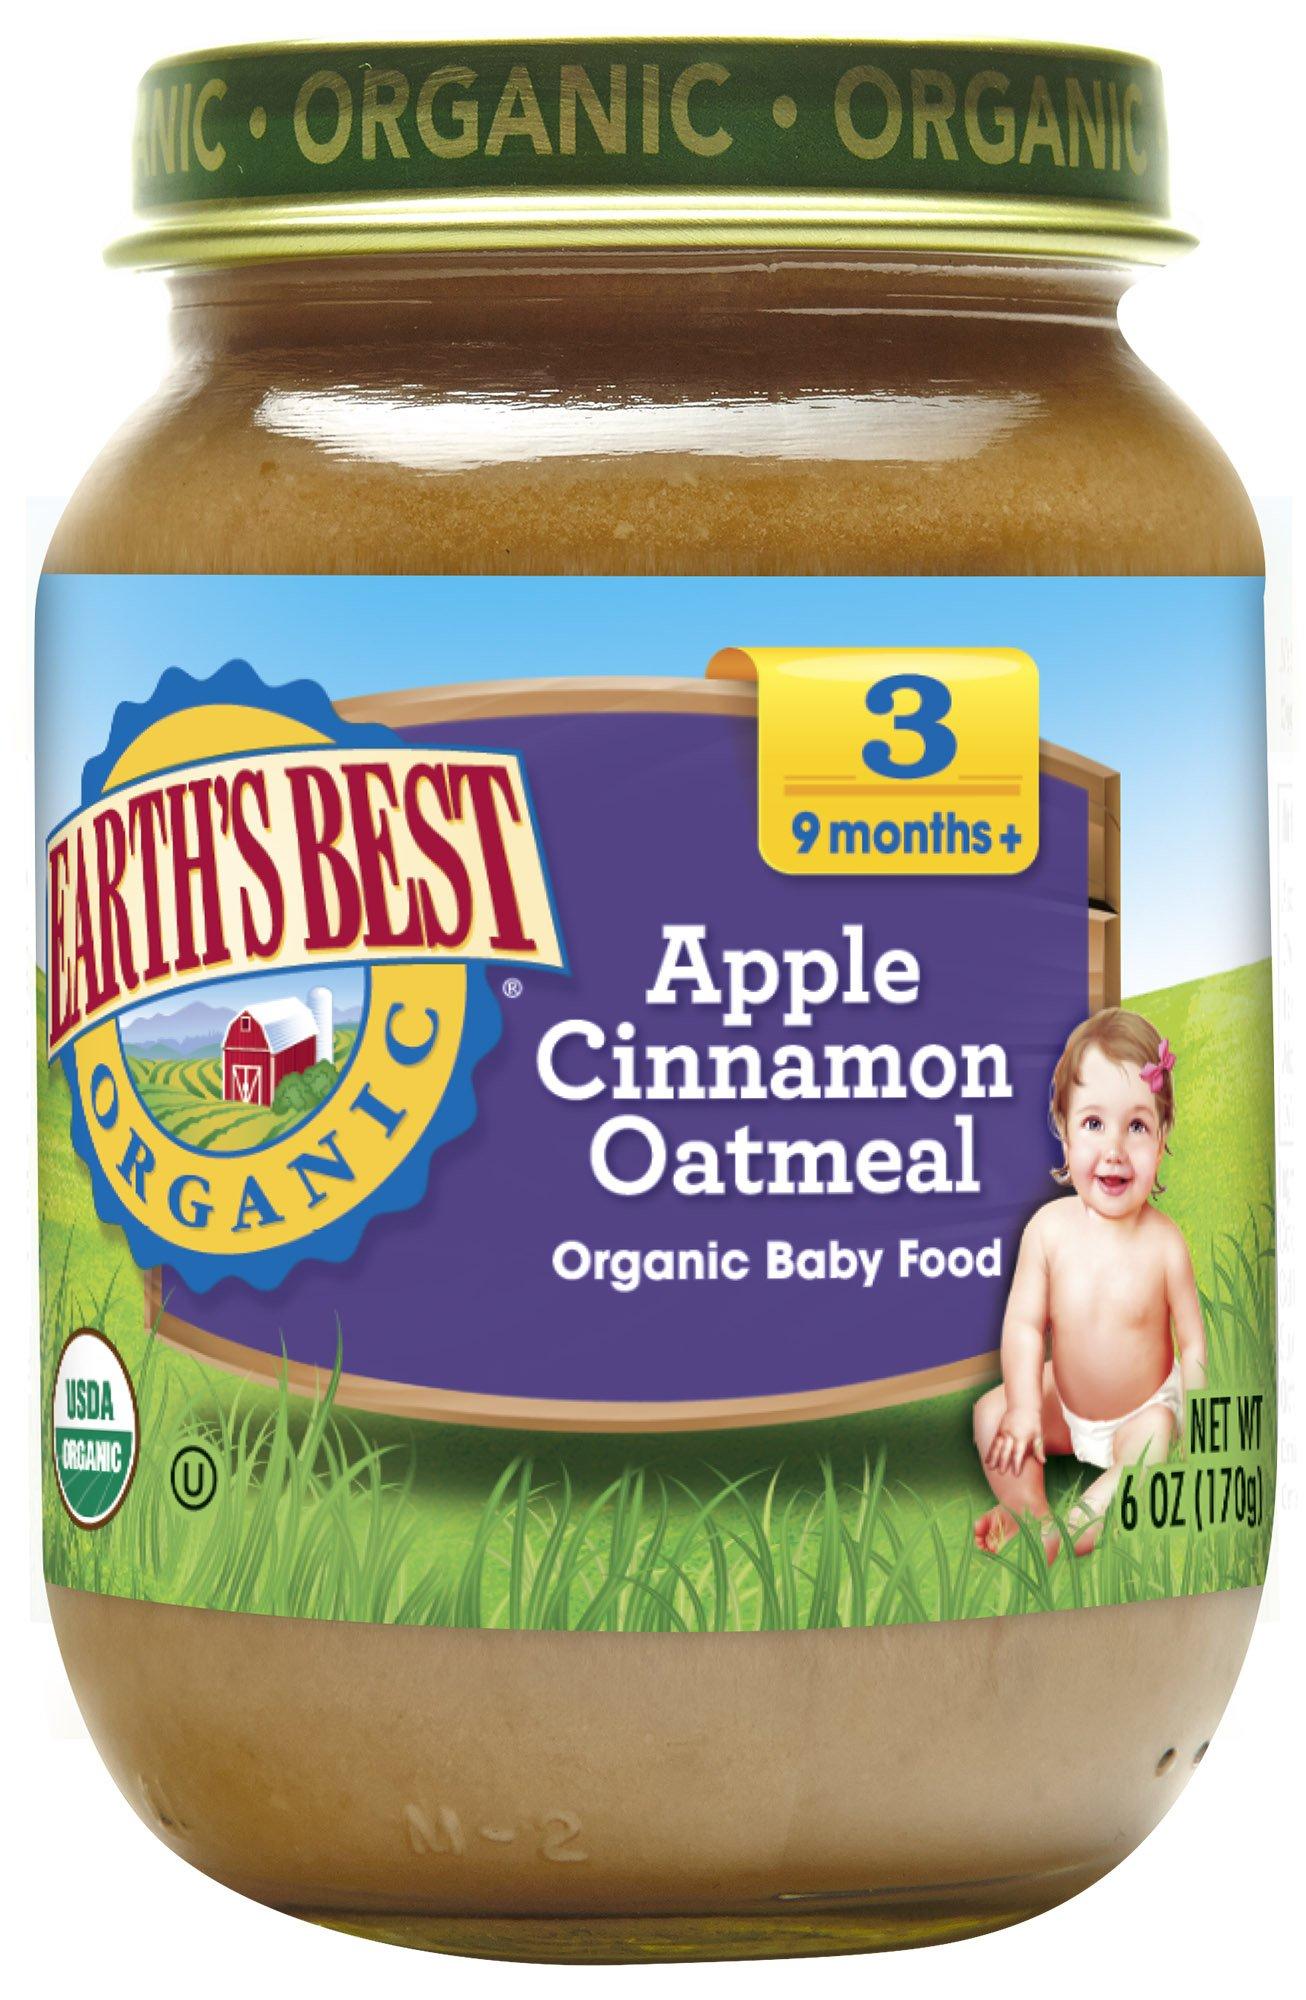 Earth's Best Organic Stage 3, Apple, Cinnamon & Oatmeal, 6 Ounce Jar (Pack of 12)